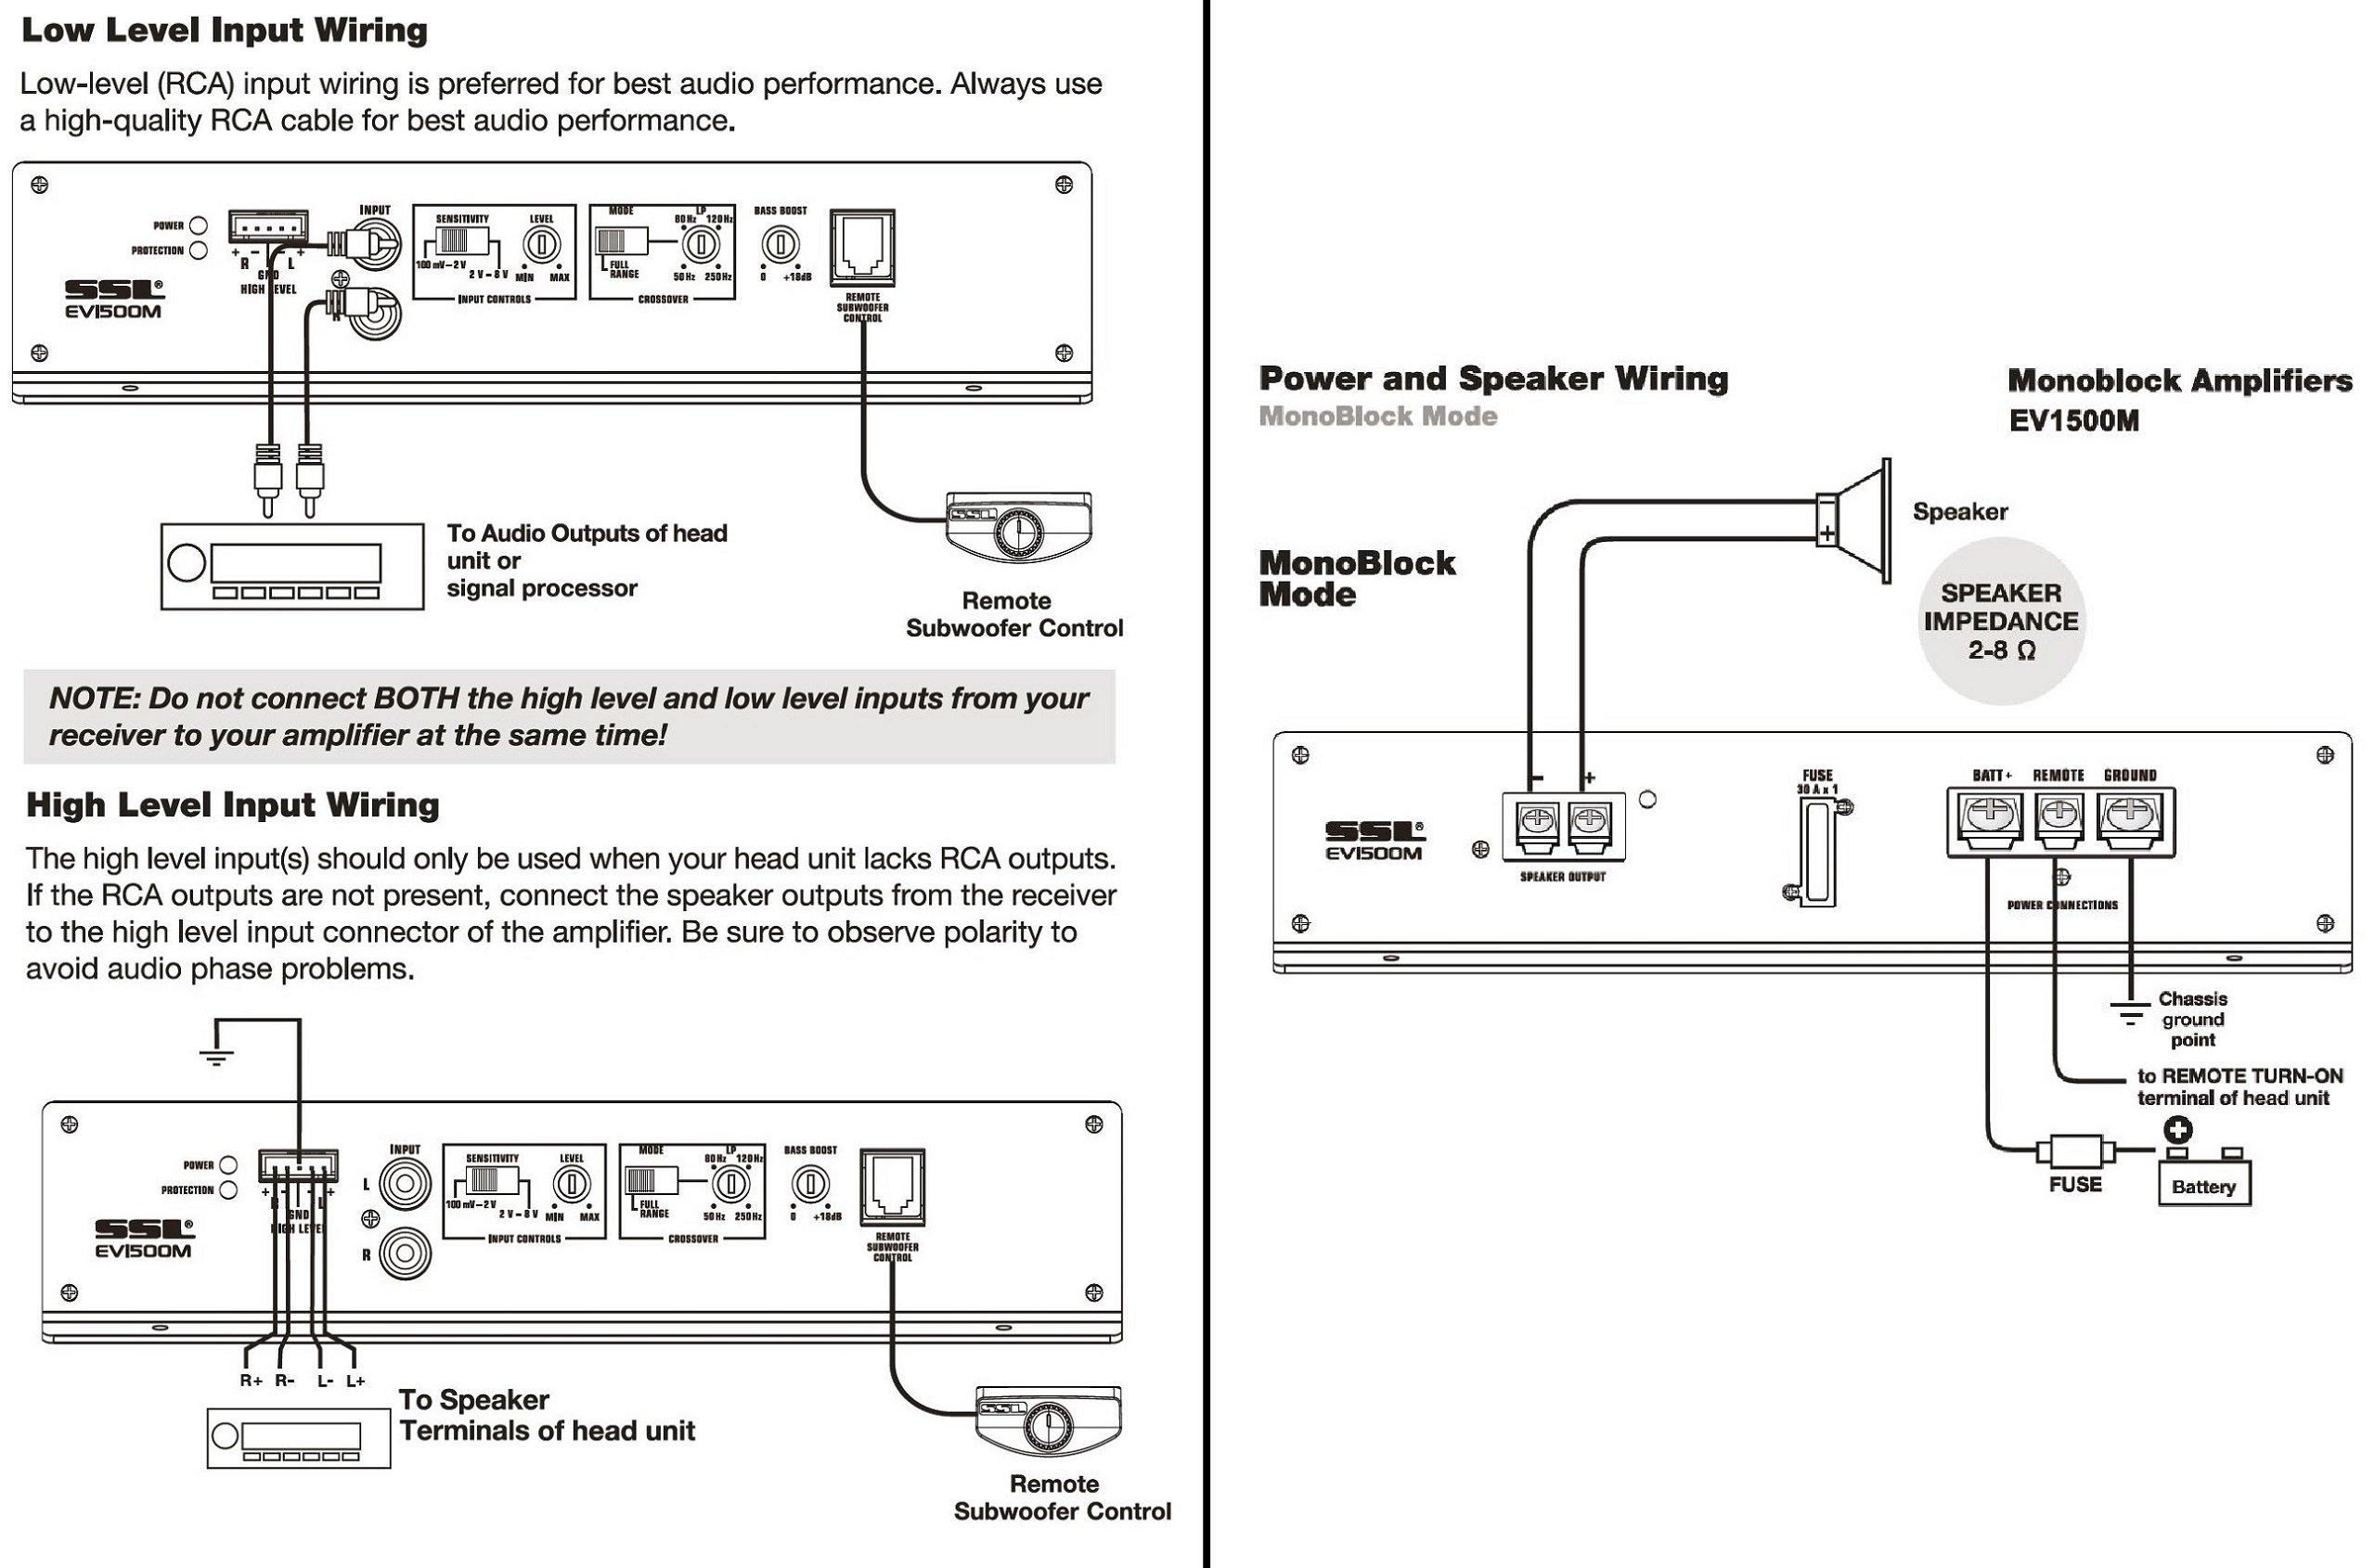 Sound Storm EV1500M Evolution 1500 Watt, 2 Ohm Stable Class A/B, Monoblock, MOSFET Car Amplifier with Remote Subwoofer Control by Sound Storm Laboratories (Image #6)